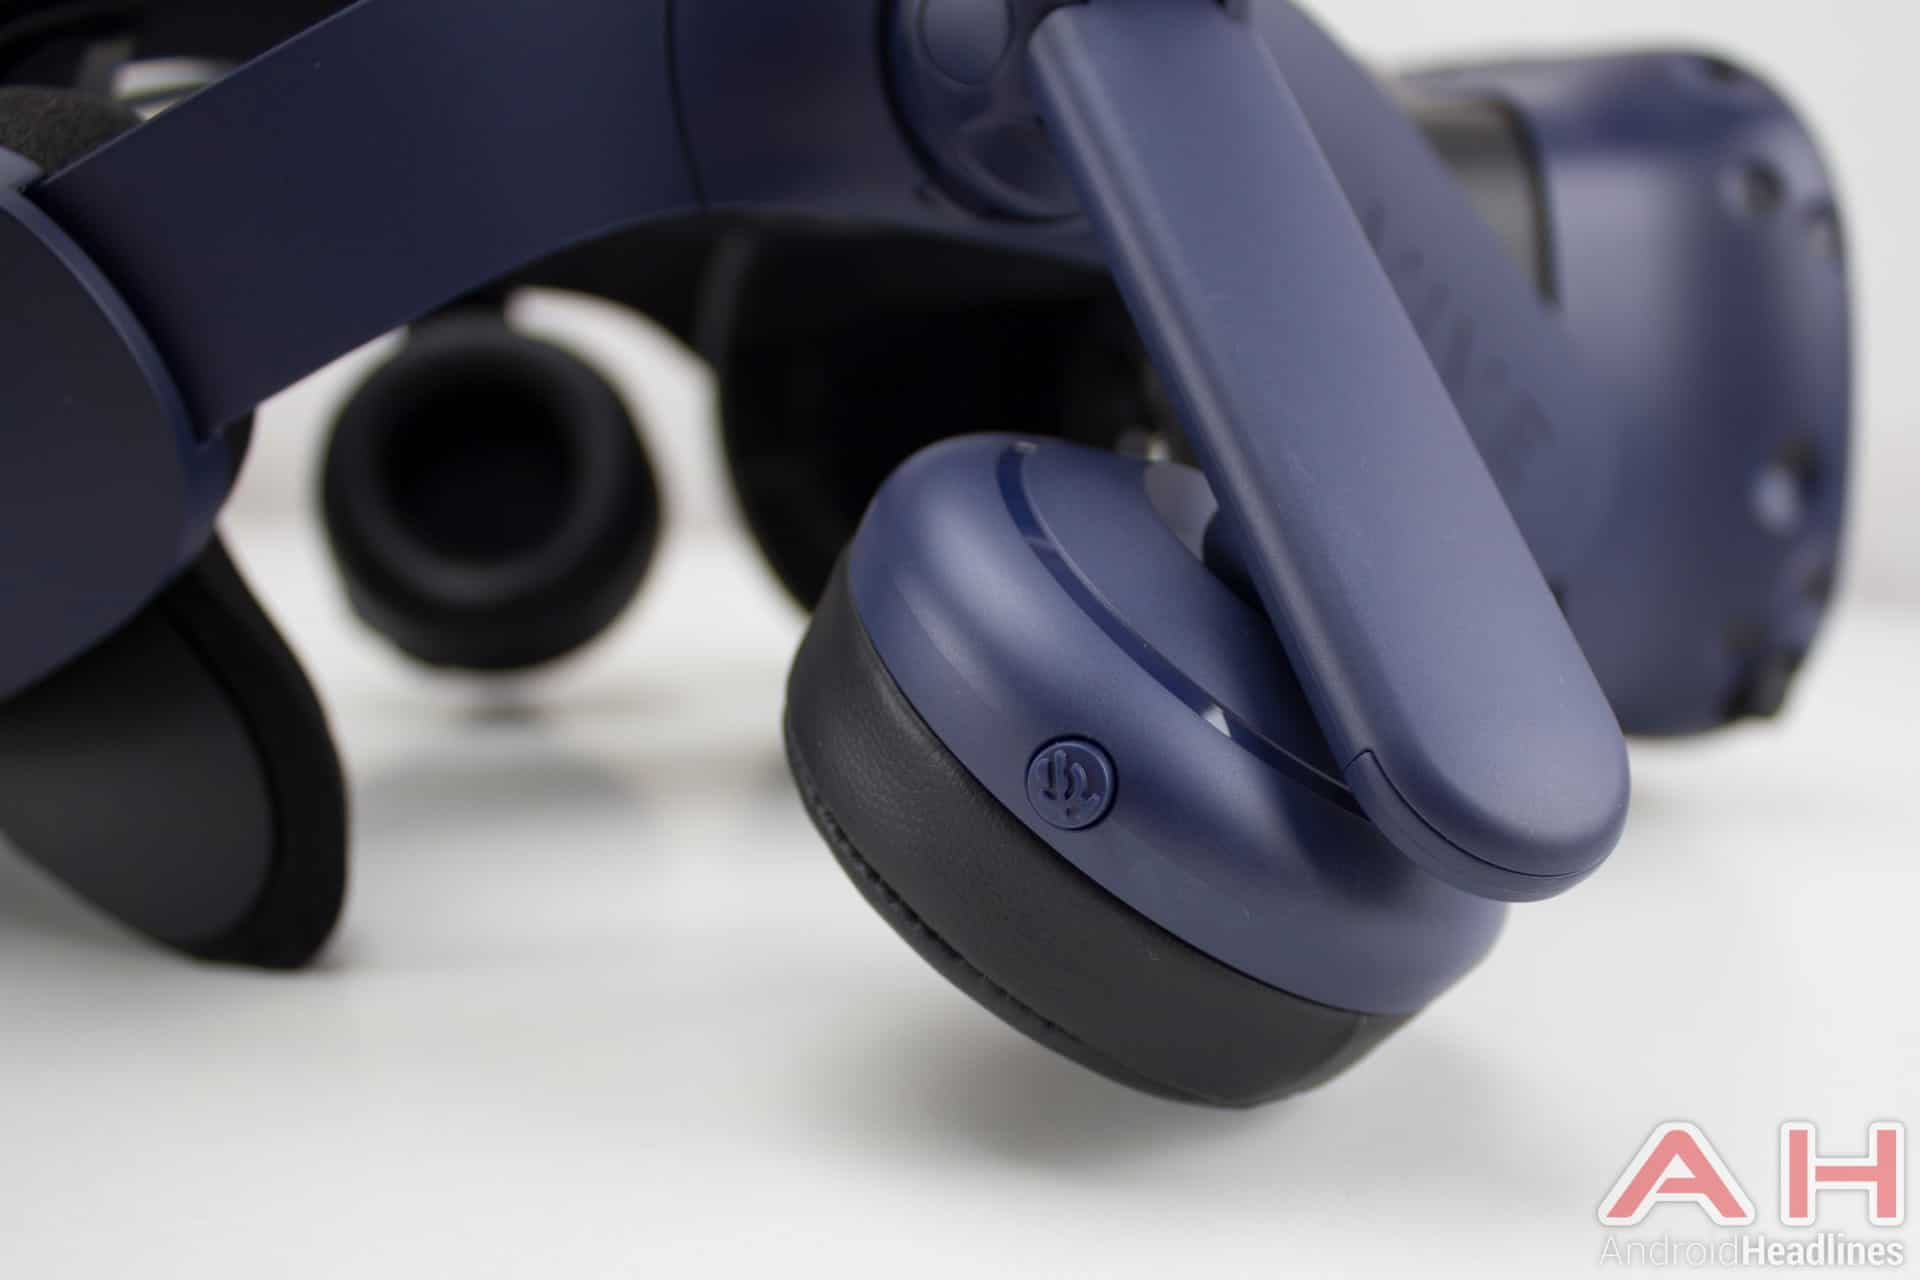 HTC Vive Pro AH NS 12